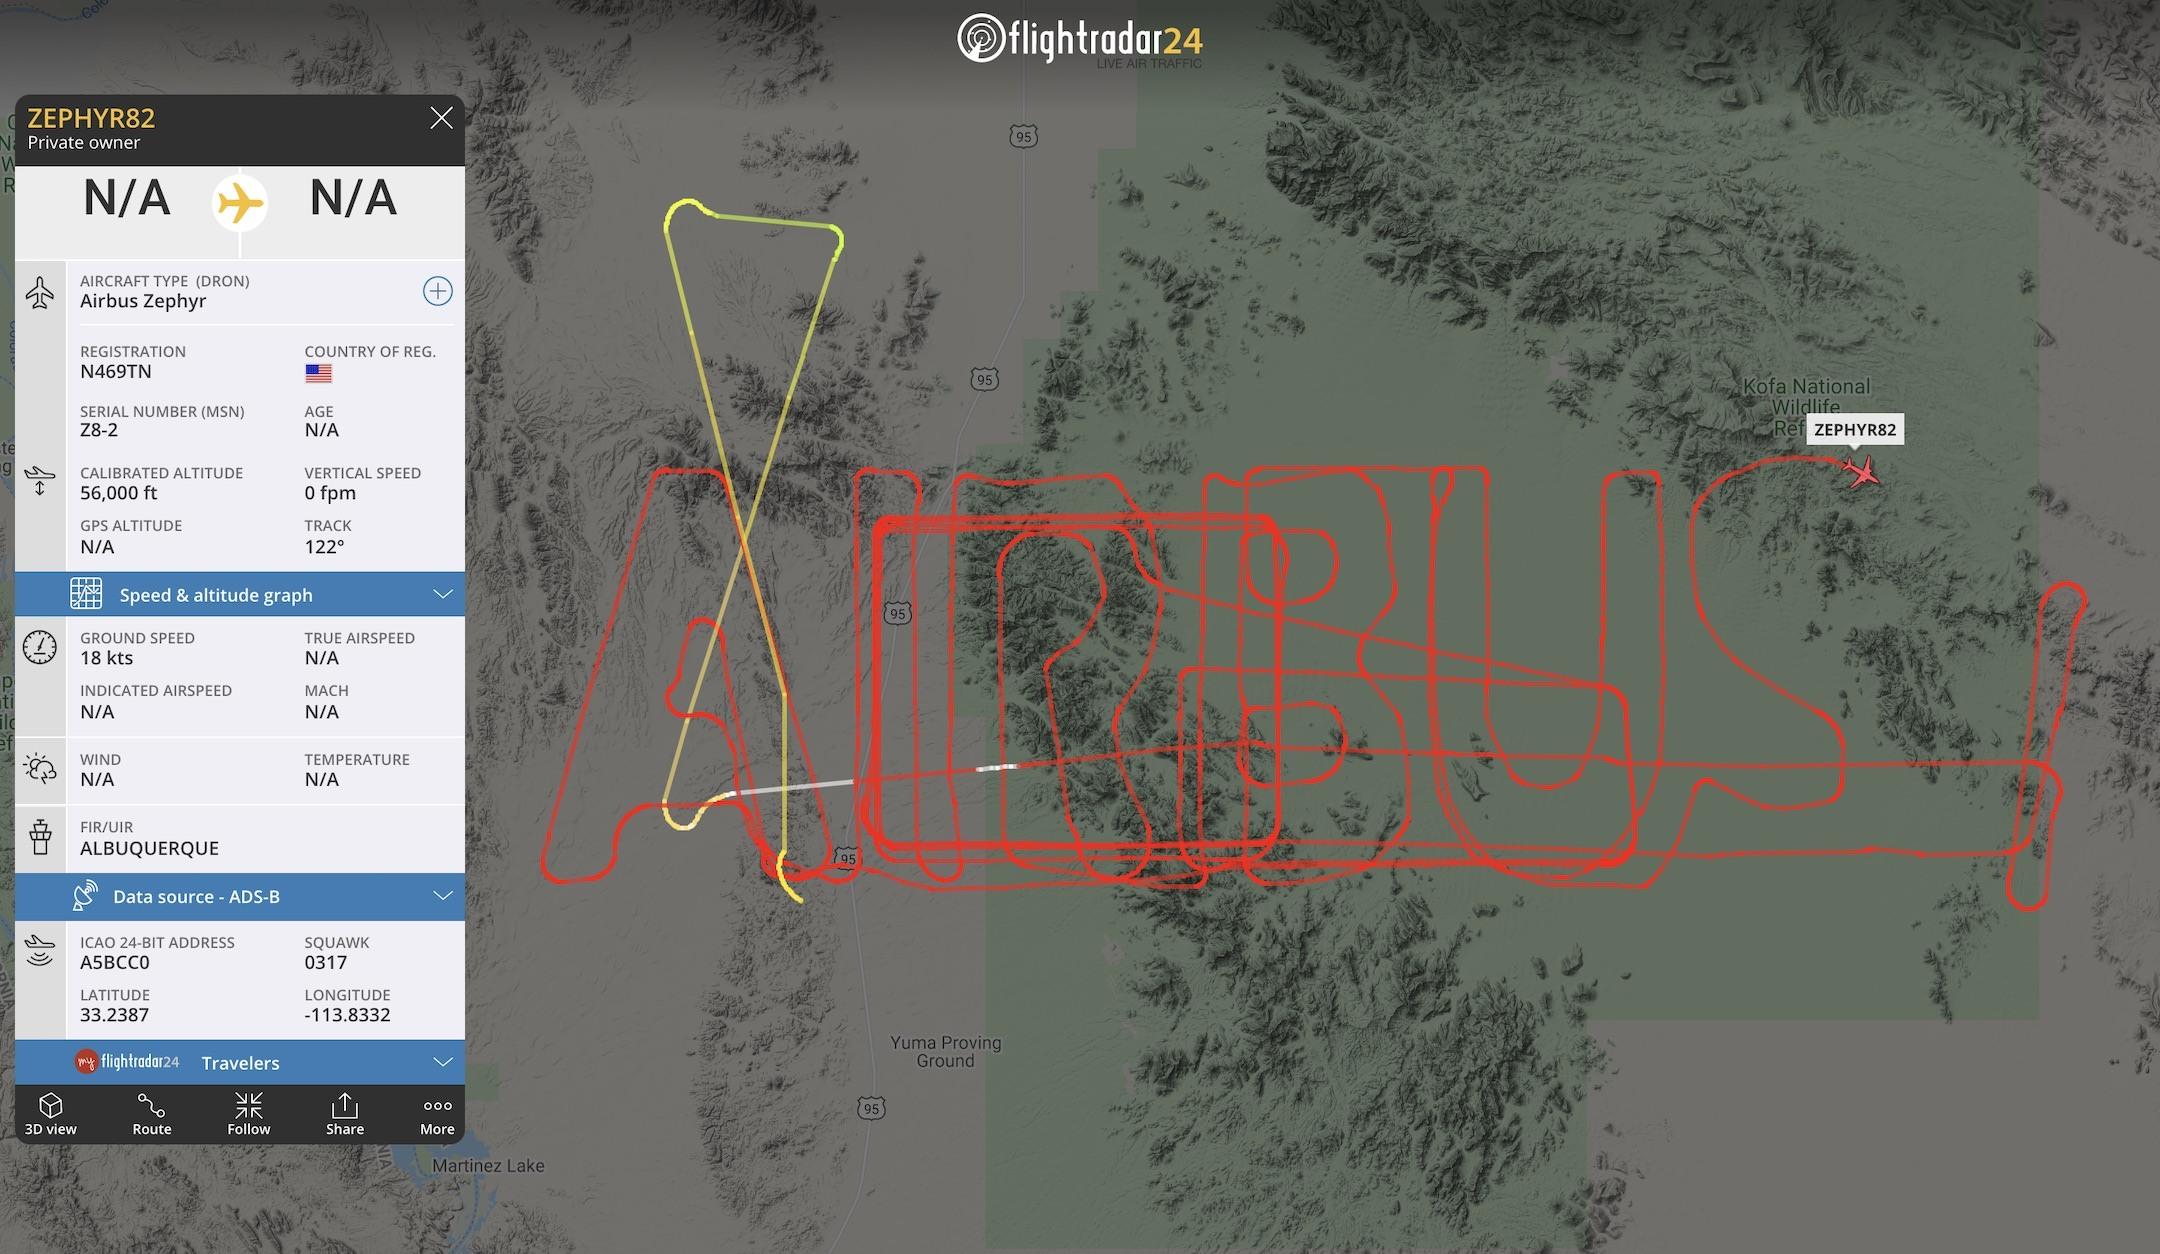 "Airbus Zephyr drawing ""AIRBUS"" in the sky"